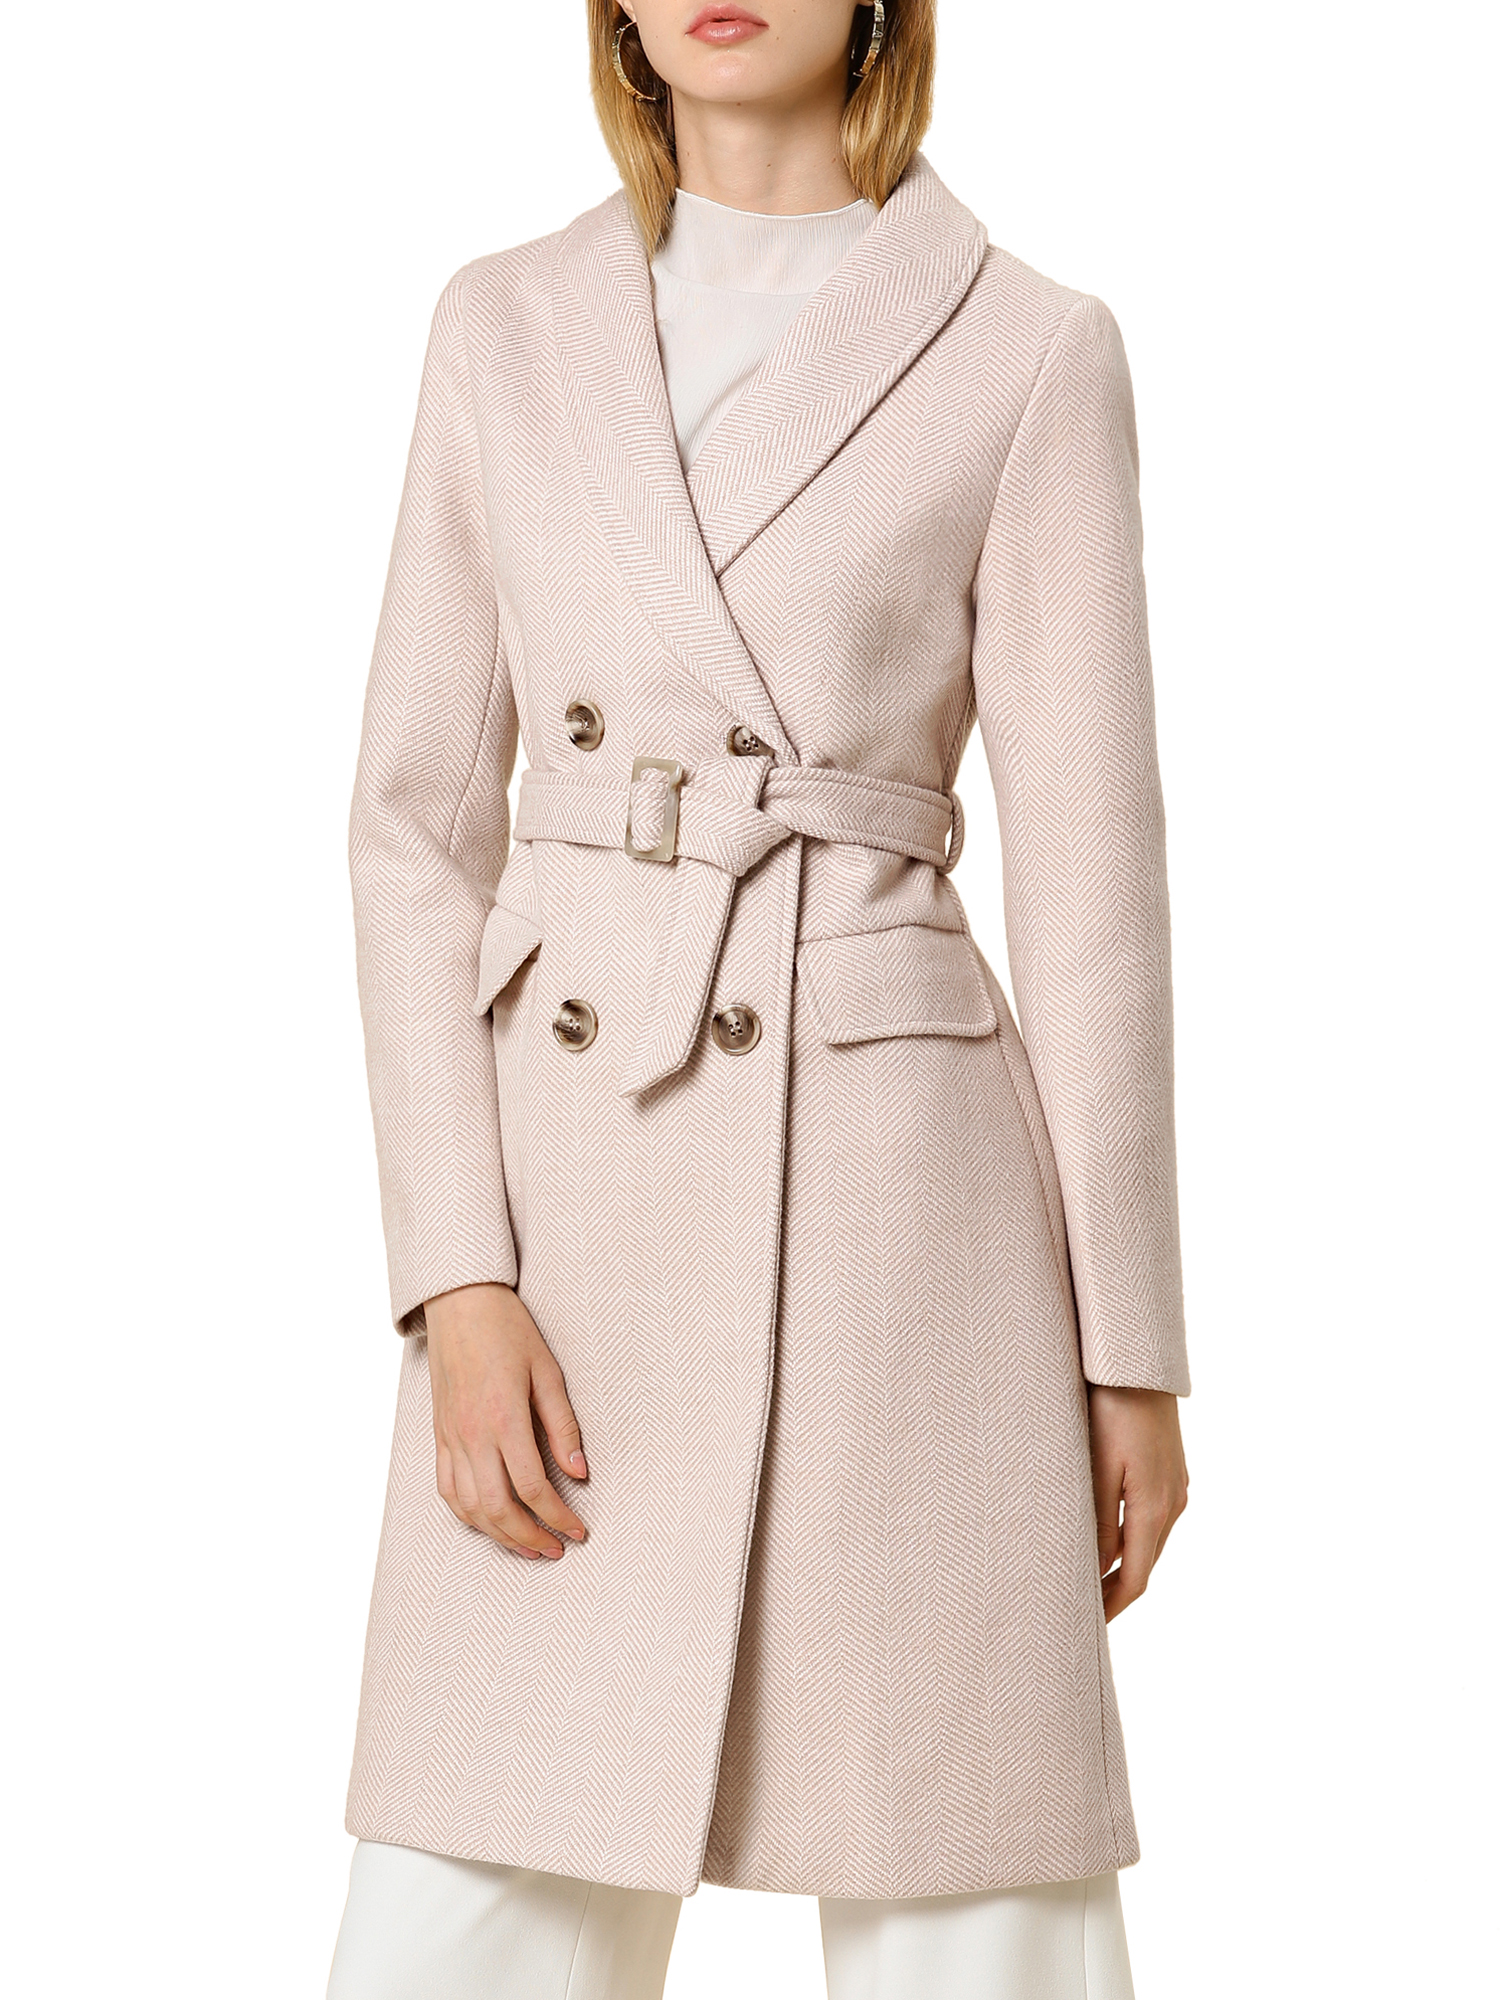 Allegra K Women's Double Breasted Belted Lapel Long Wool Coat Apricot M (US 10)